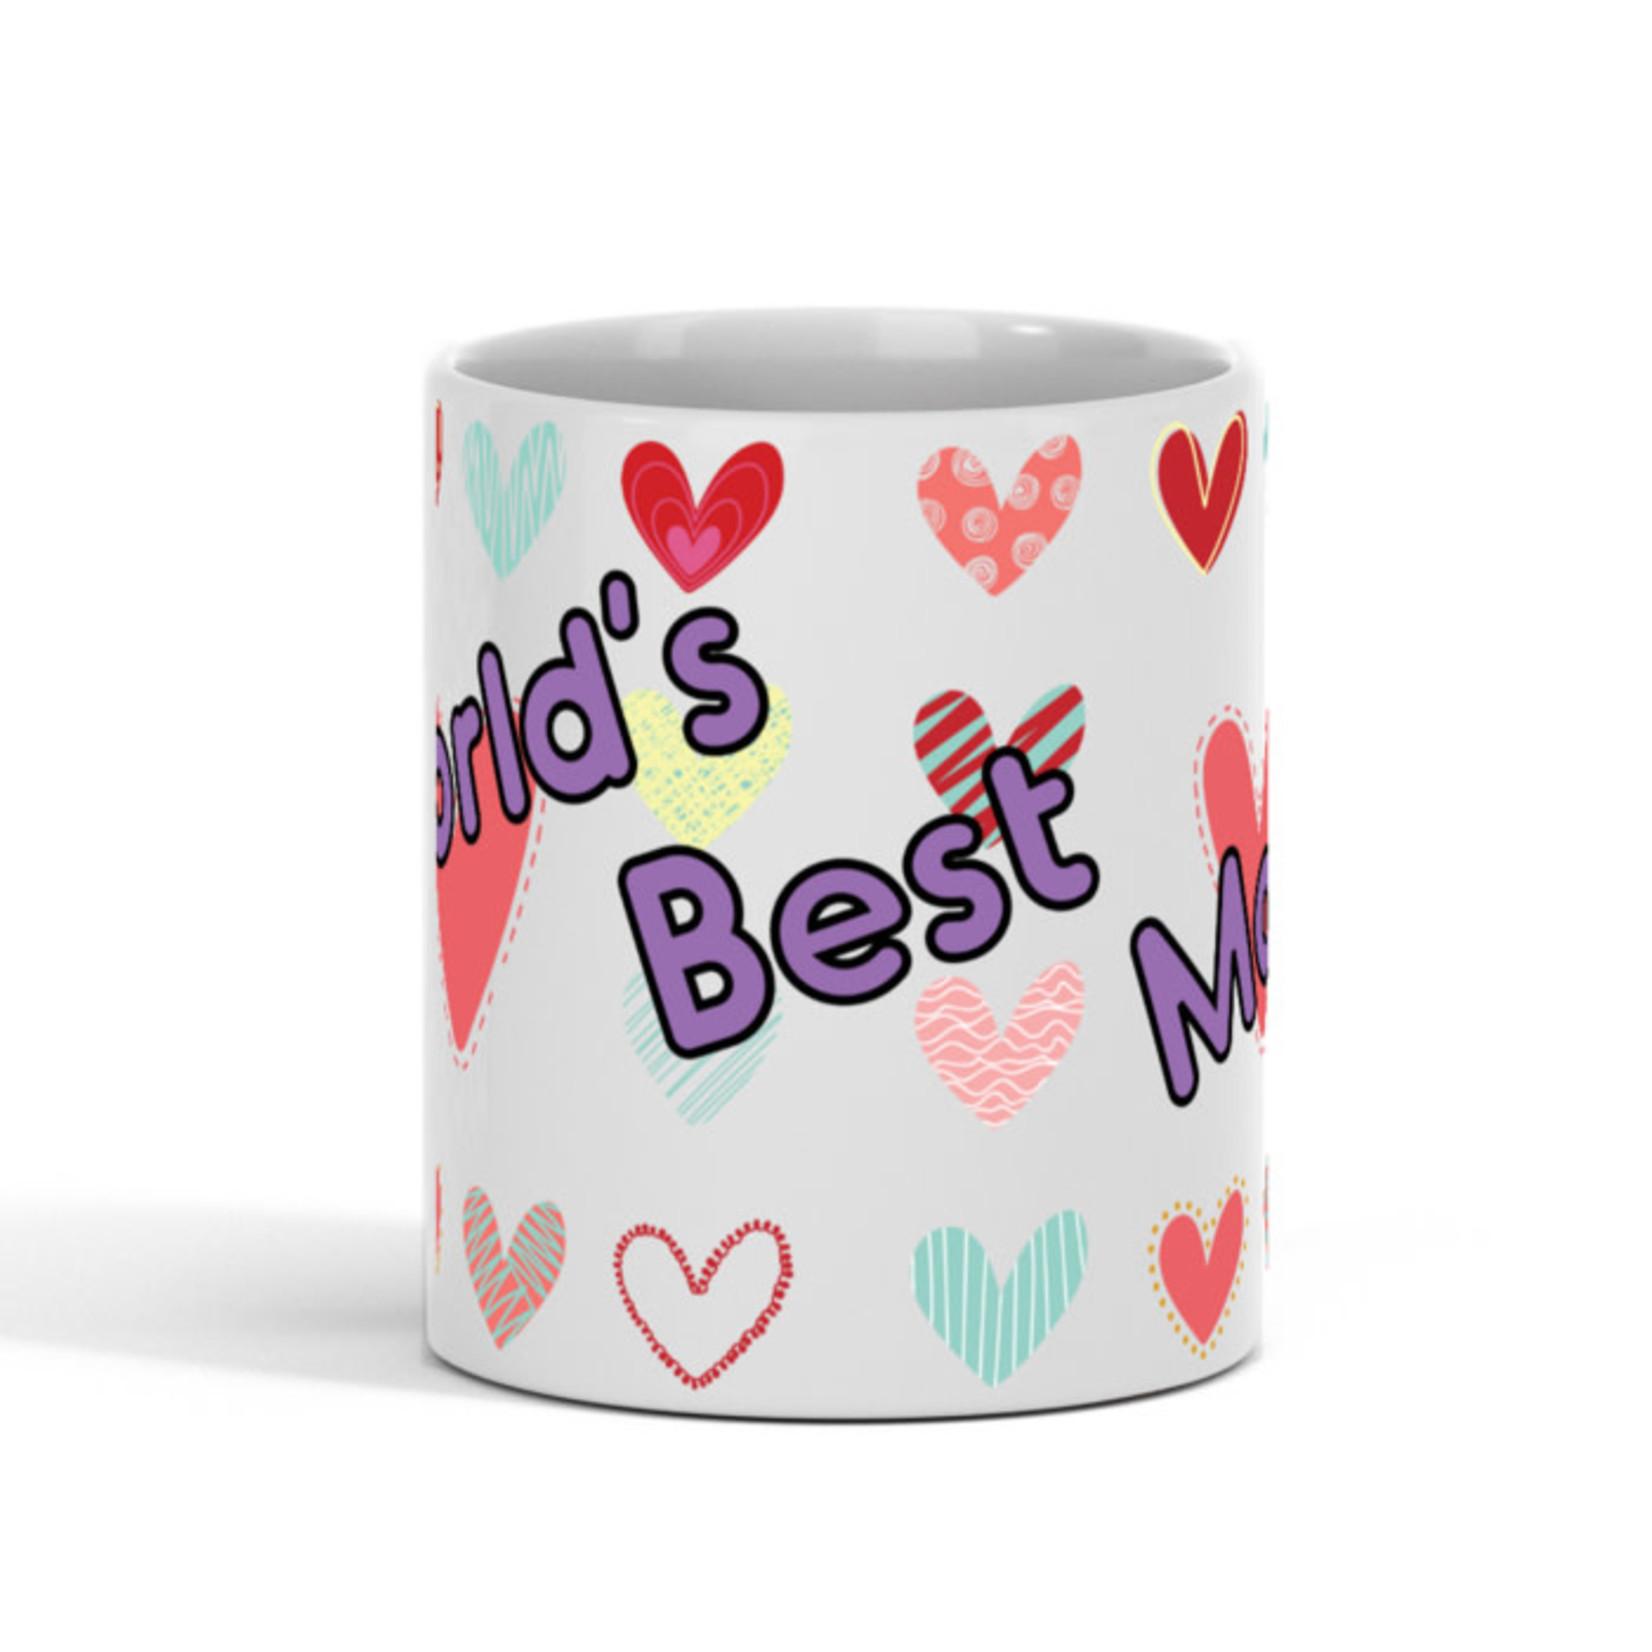 'World's Best Mom'' Mug